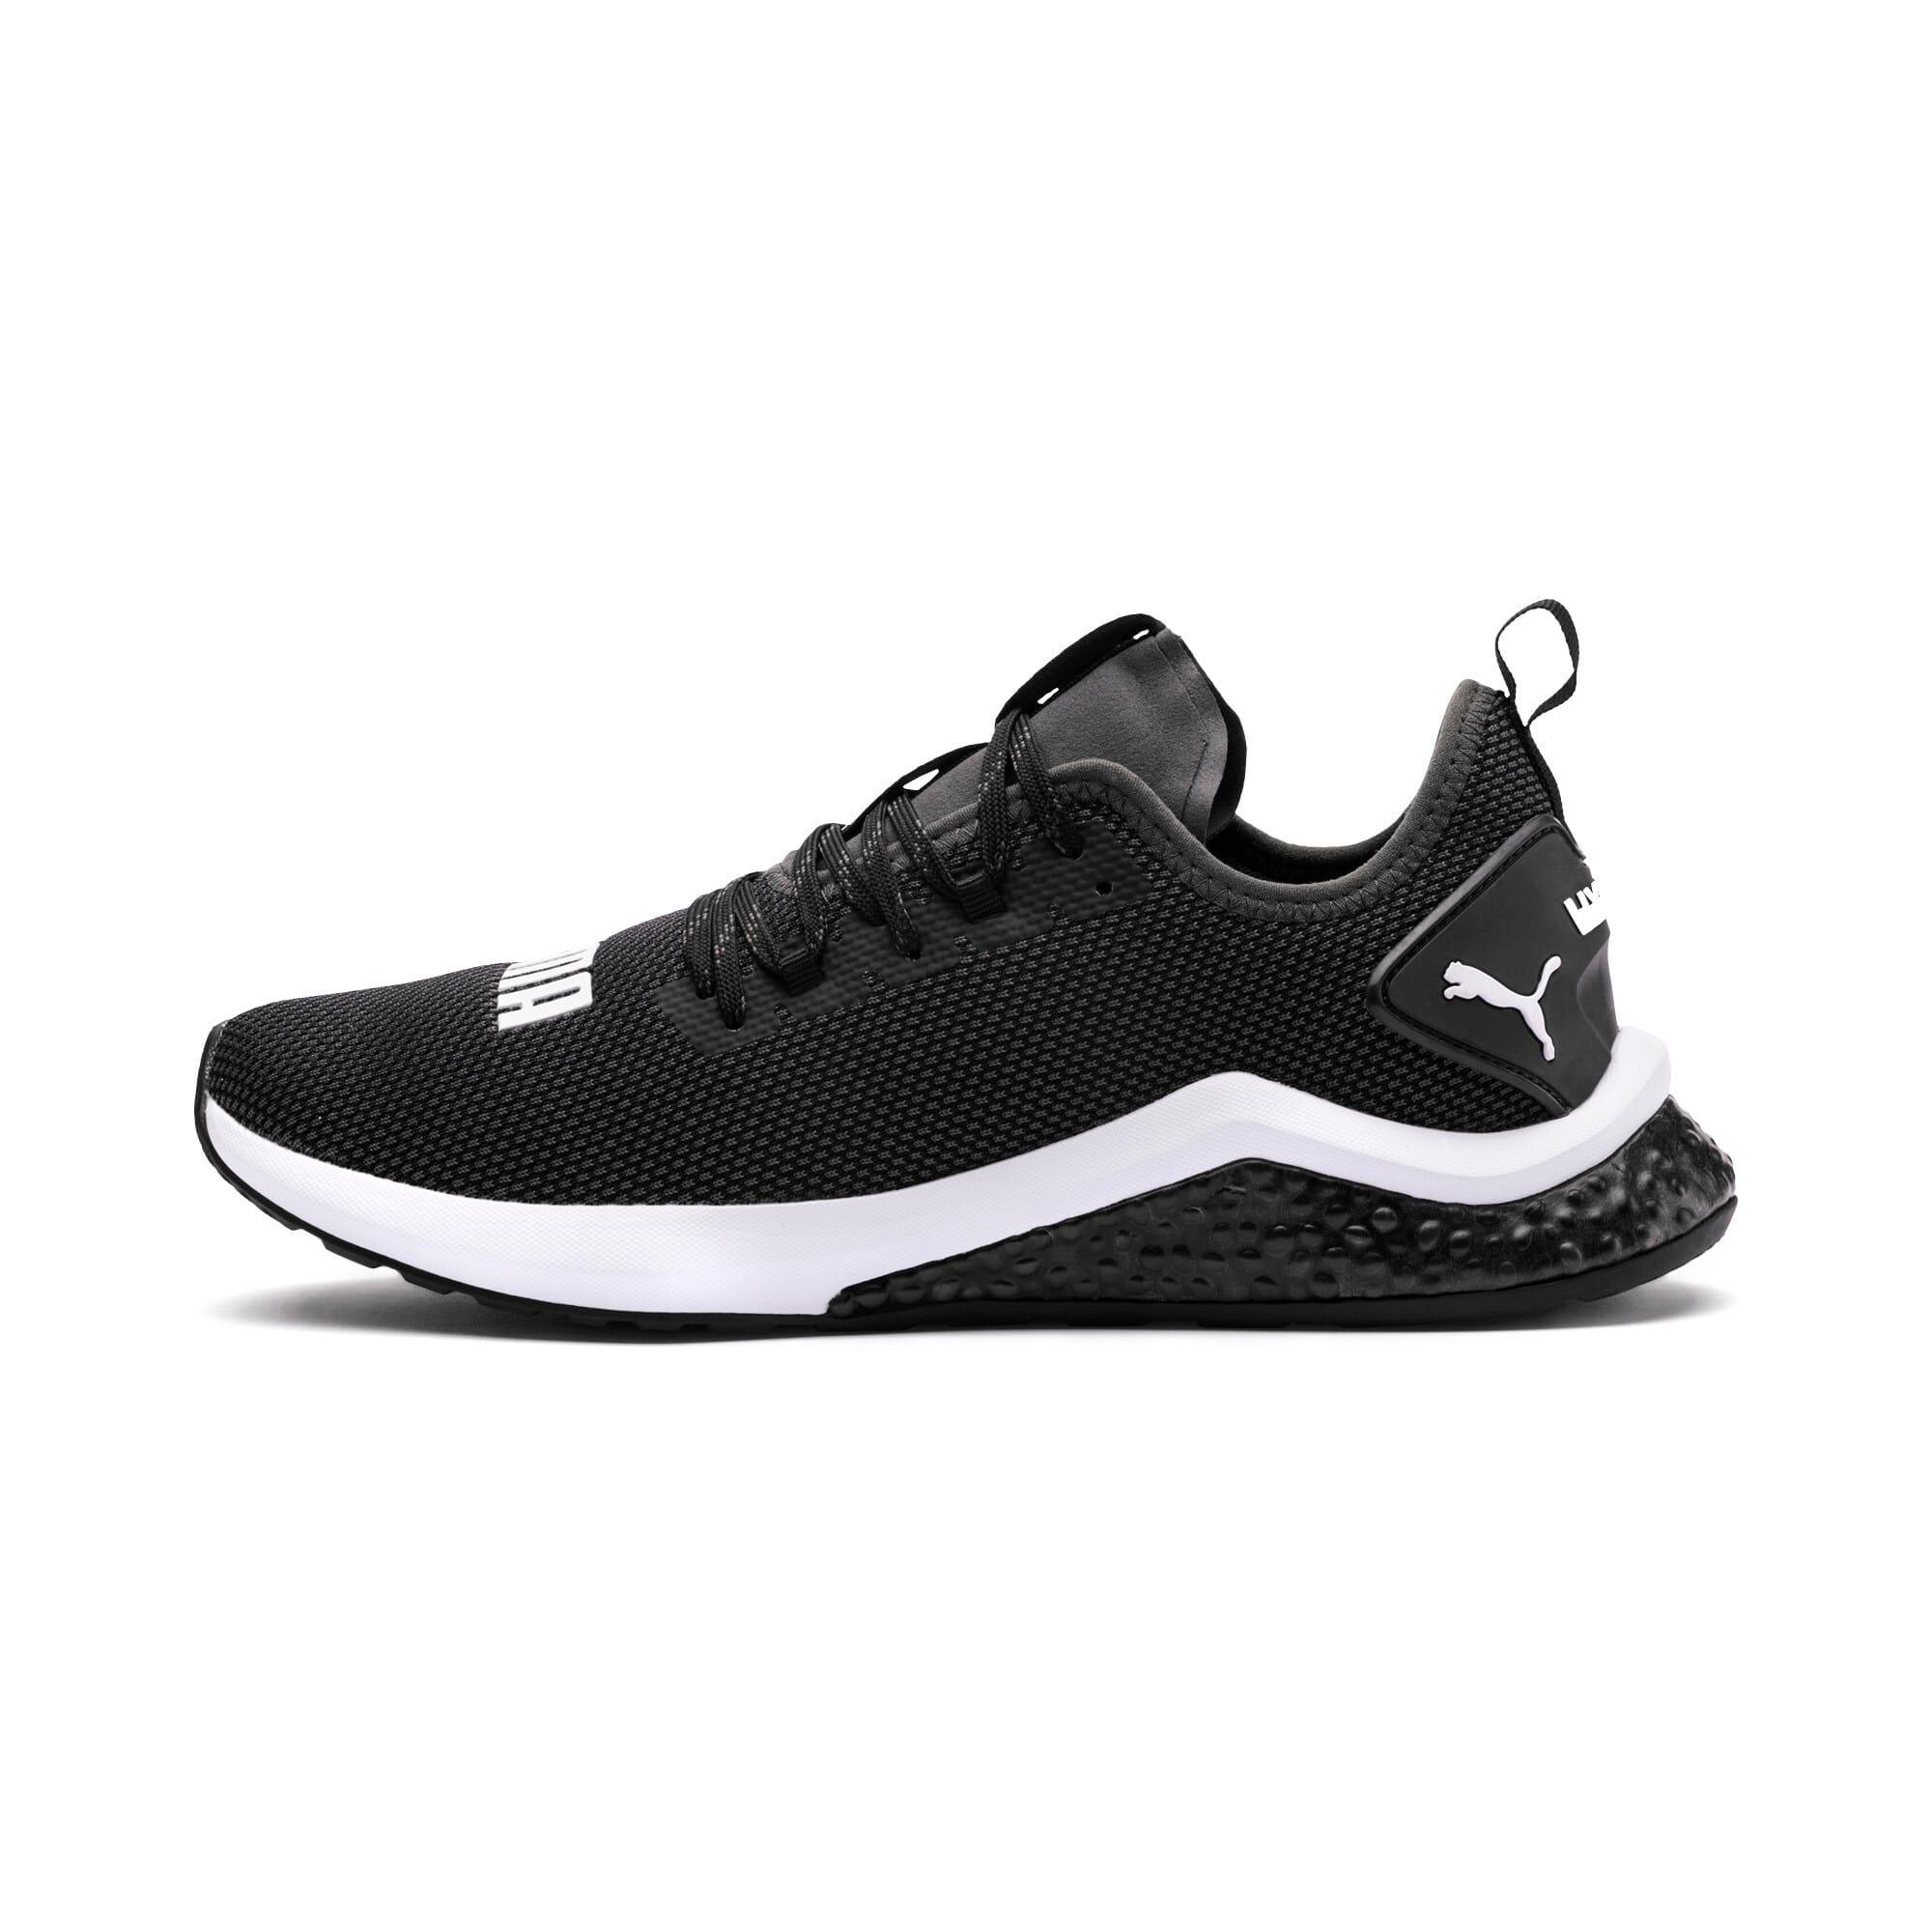 Thumbnail 1 of HYBRID NX Men's Running Shoes, Puma Black-Puma White, medium